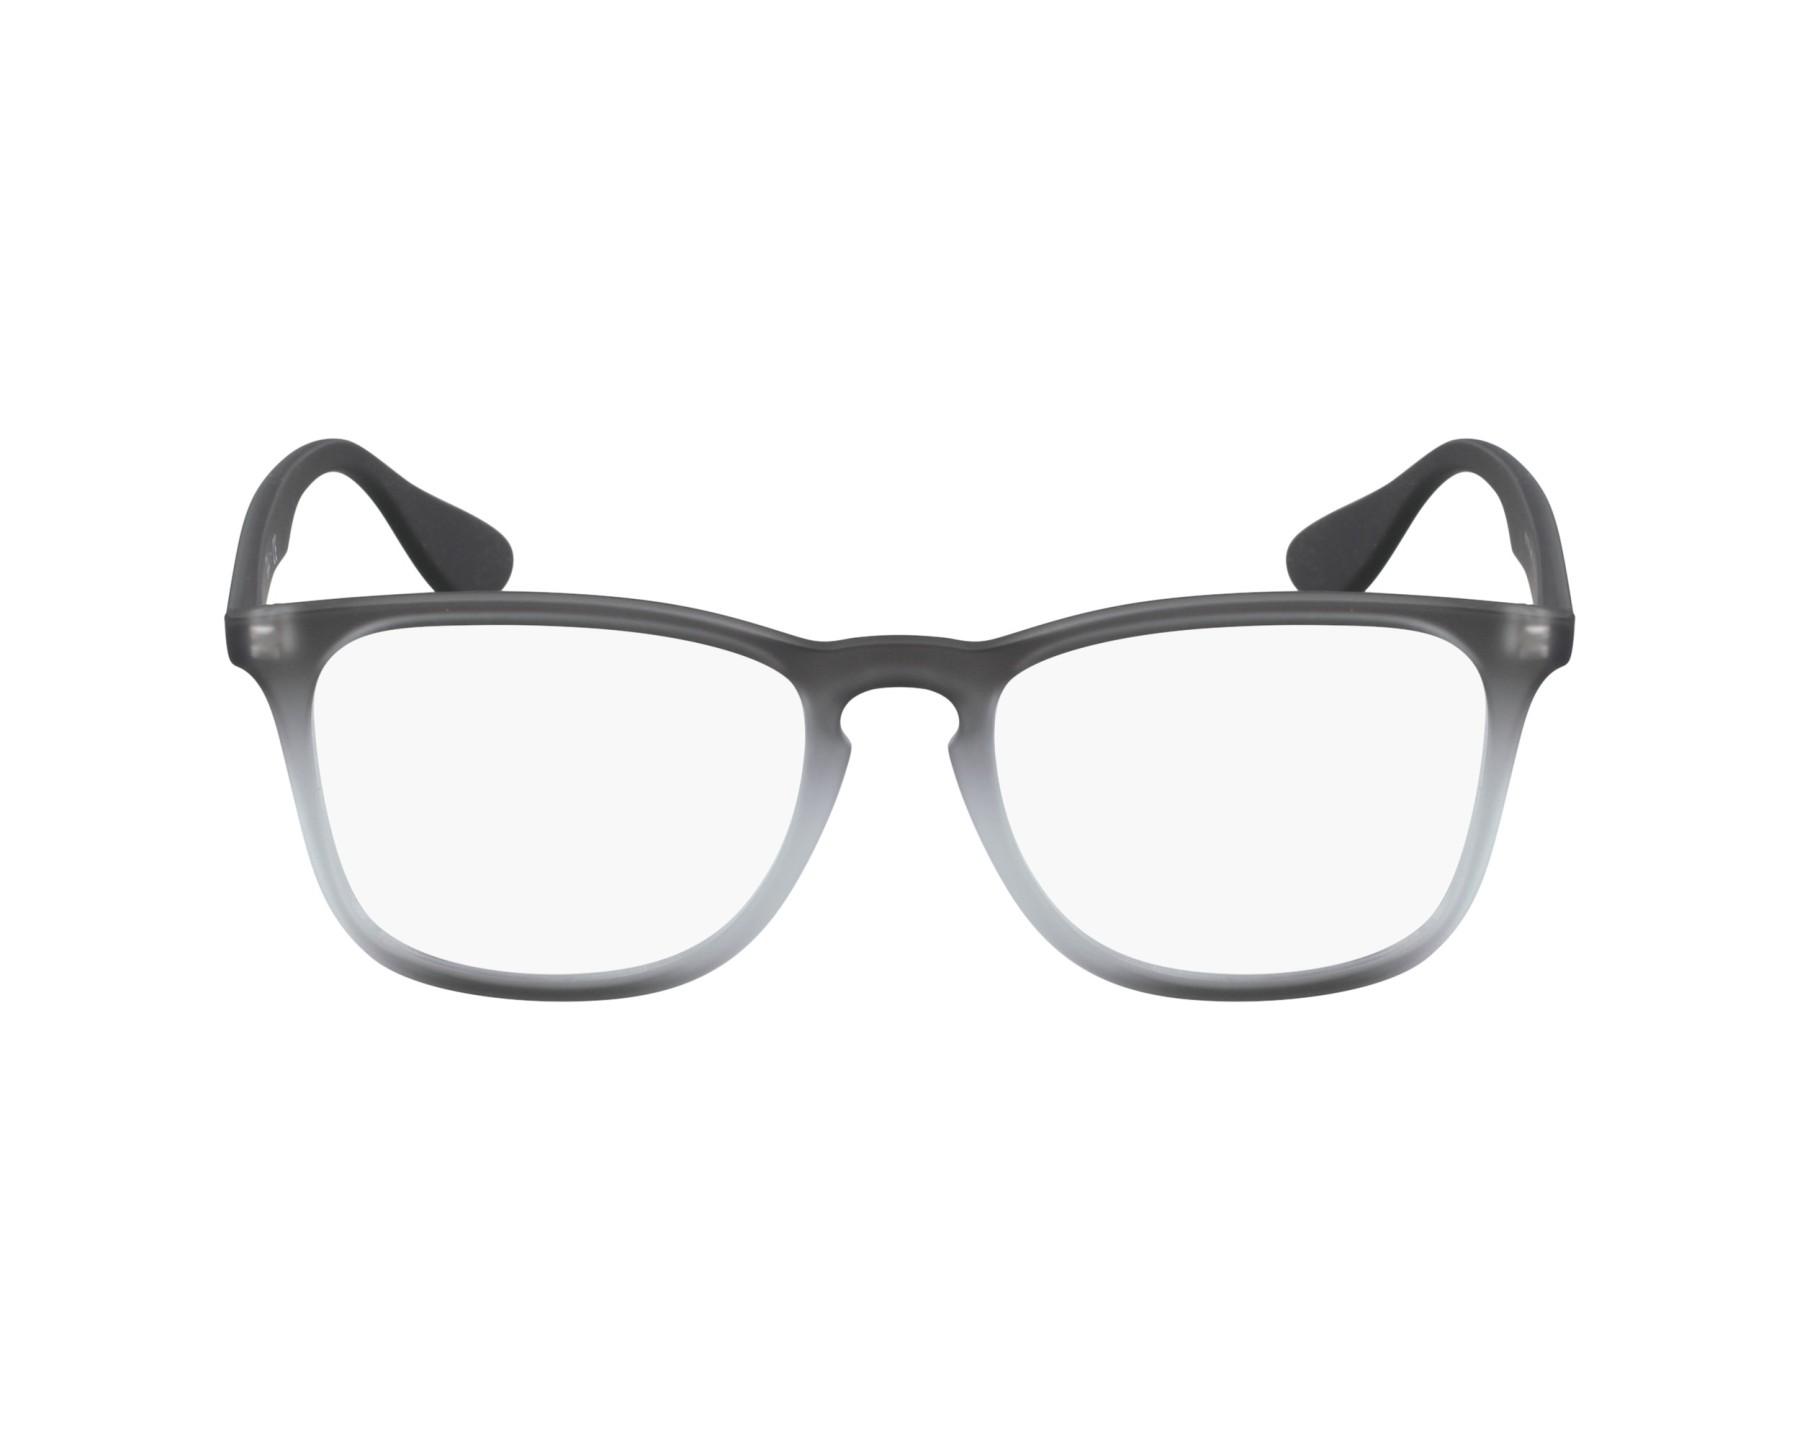 Glasses Frame Repair Edinburgh : How To Adjust Ray Ban Plastic Frames